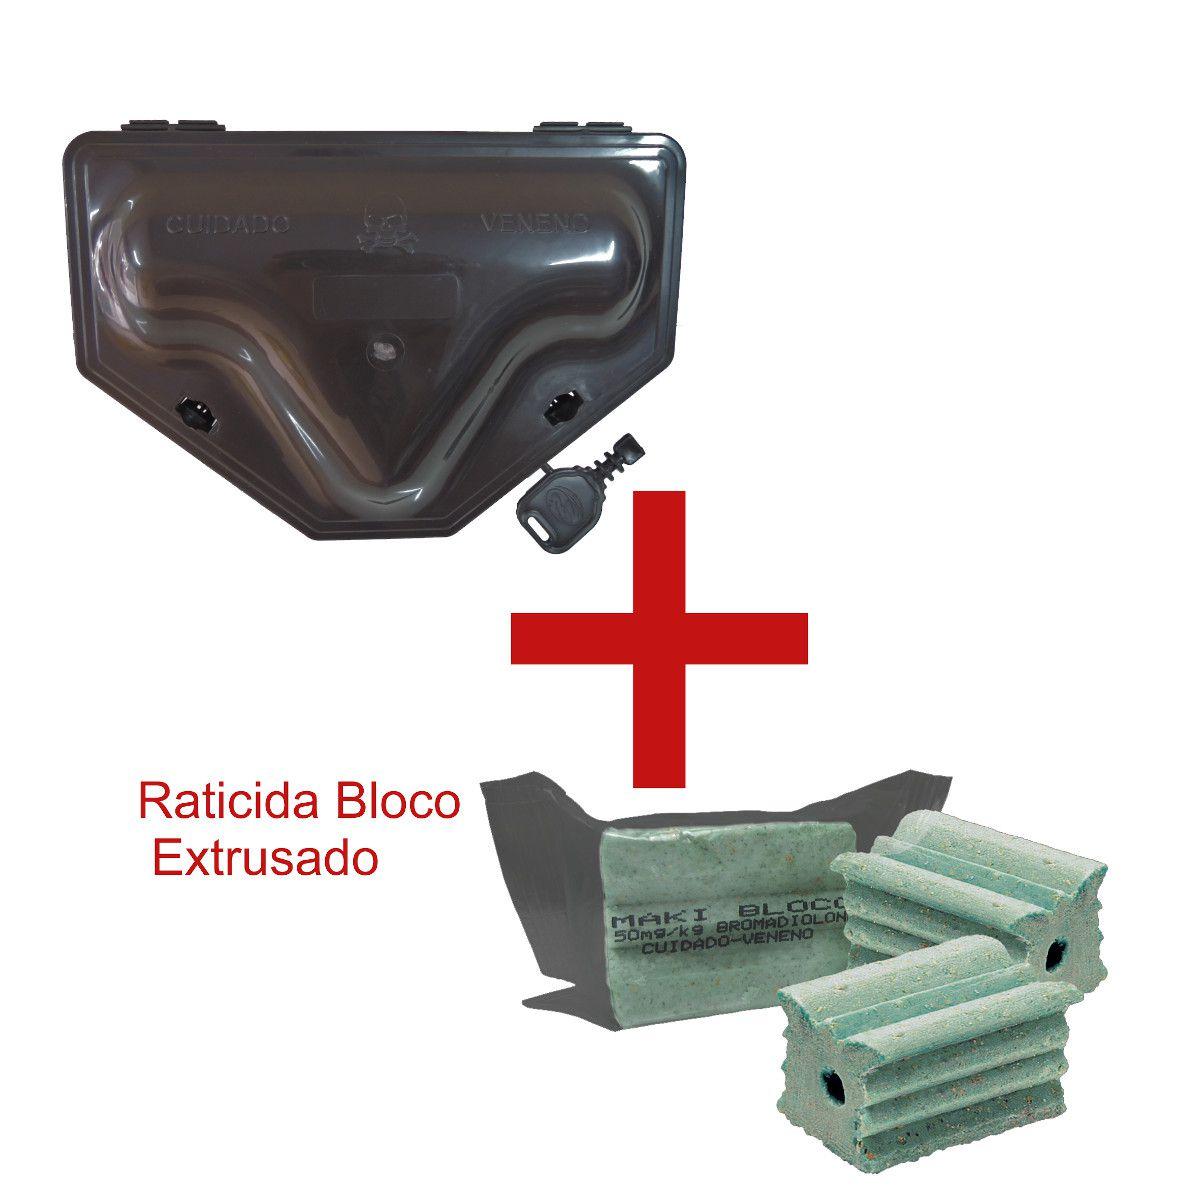 KIT 18 Porta Iscas Reforçado Ratoeira 2 TRAVAS Chave p/Ratos